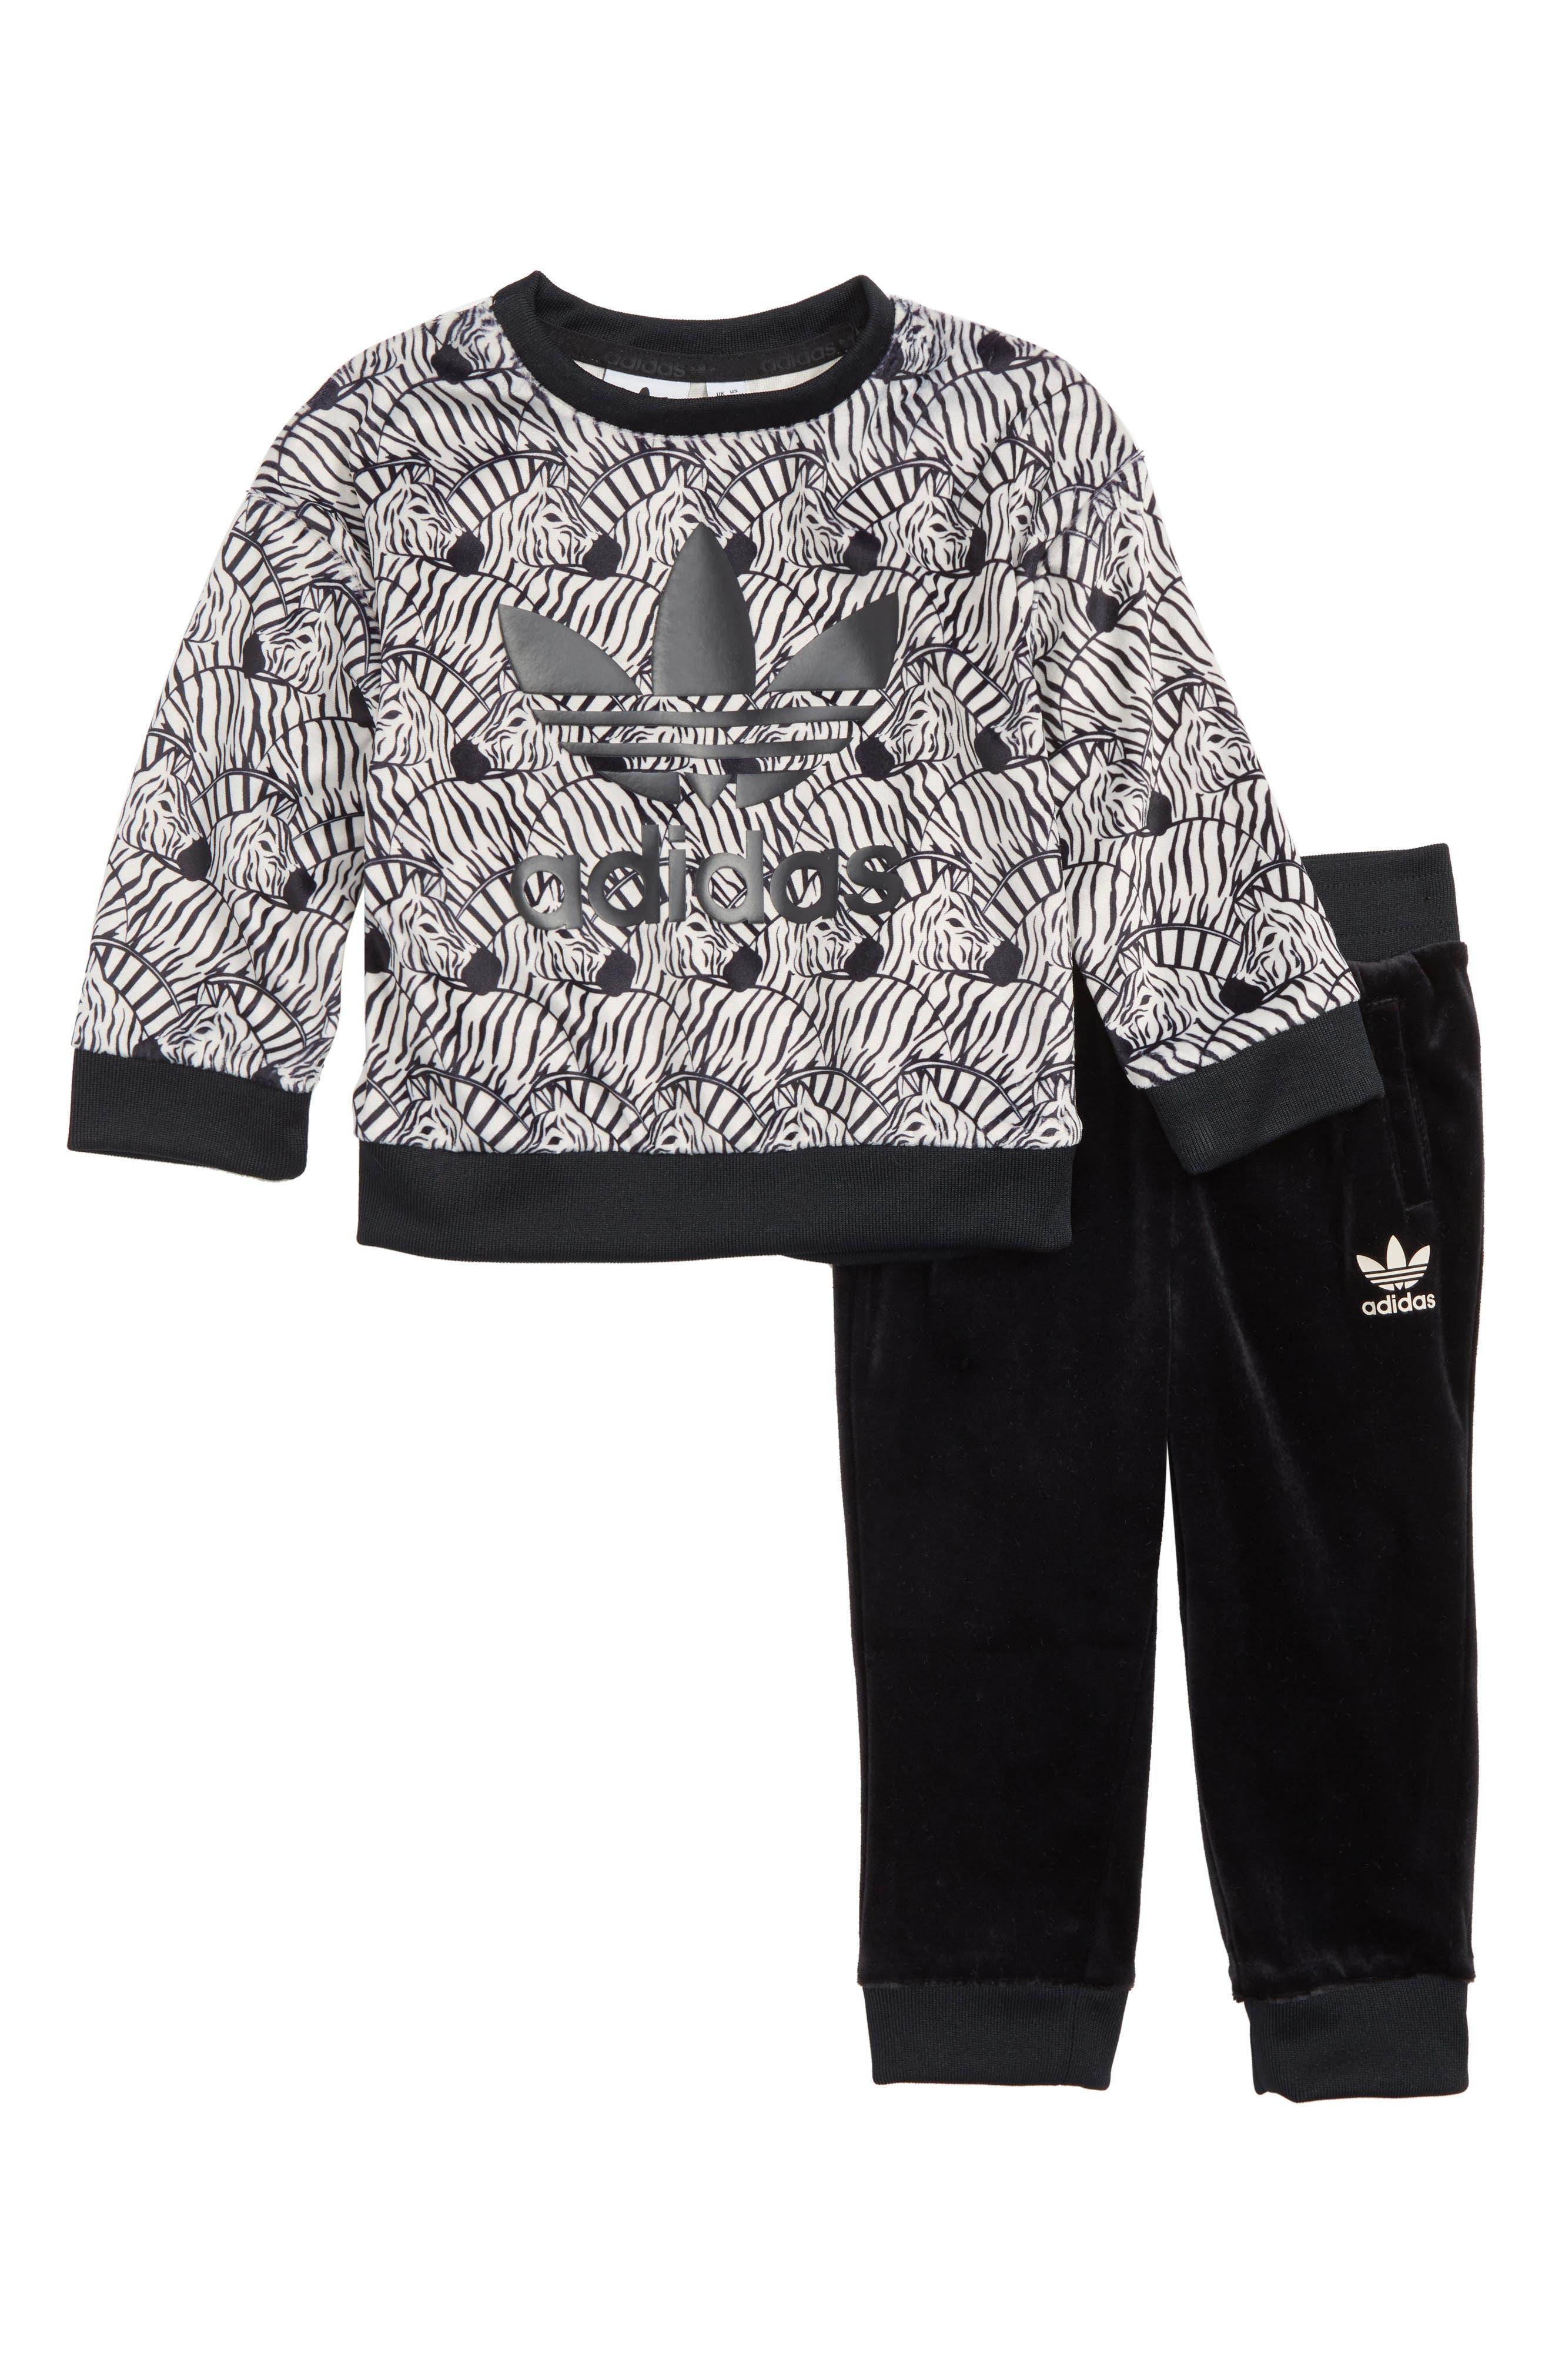 Toddler Girls Adidas Originals Zebra Sweatshirt  Velvet Pants Set